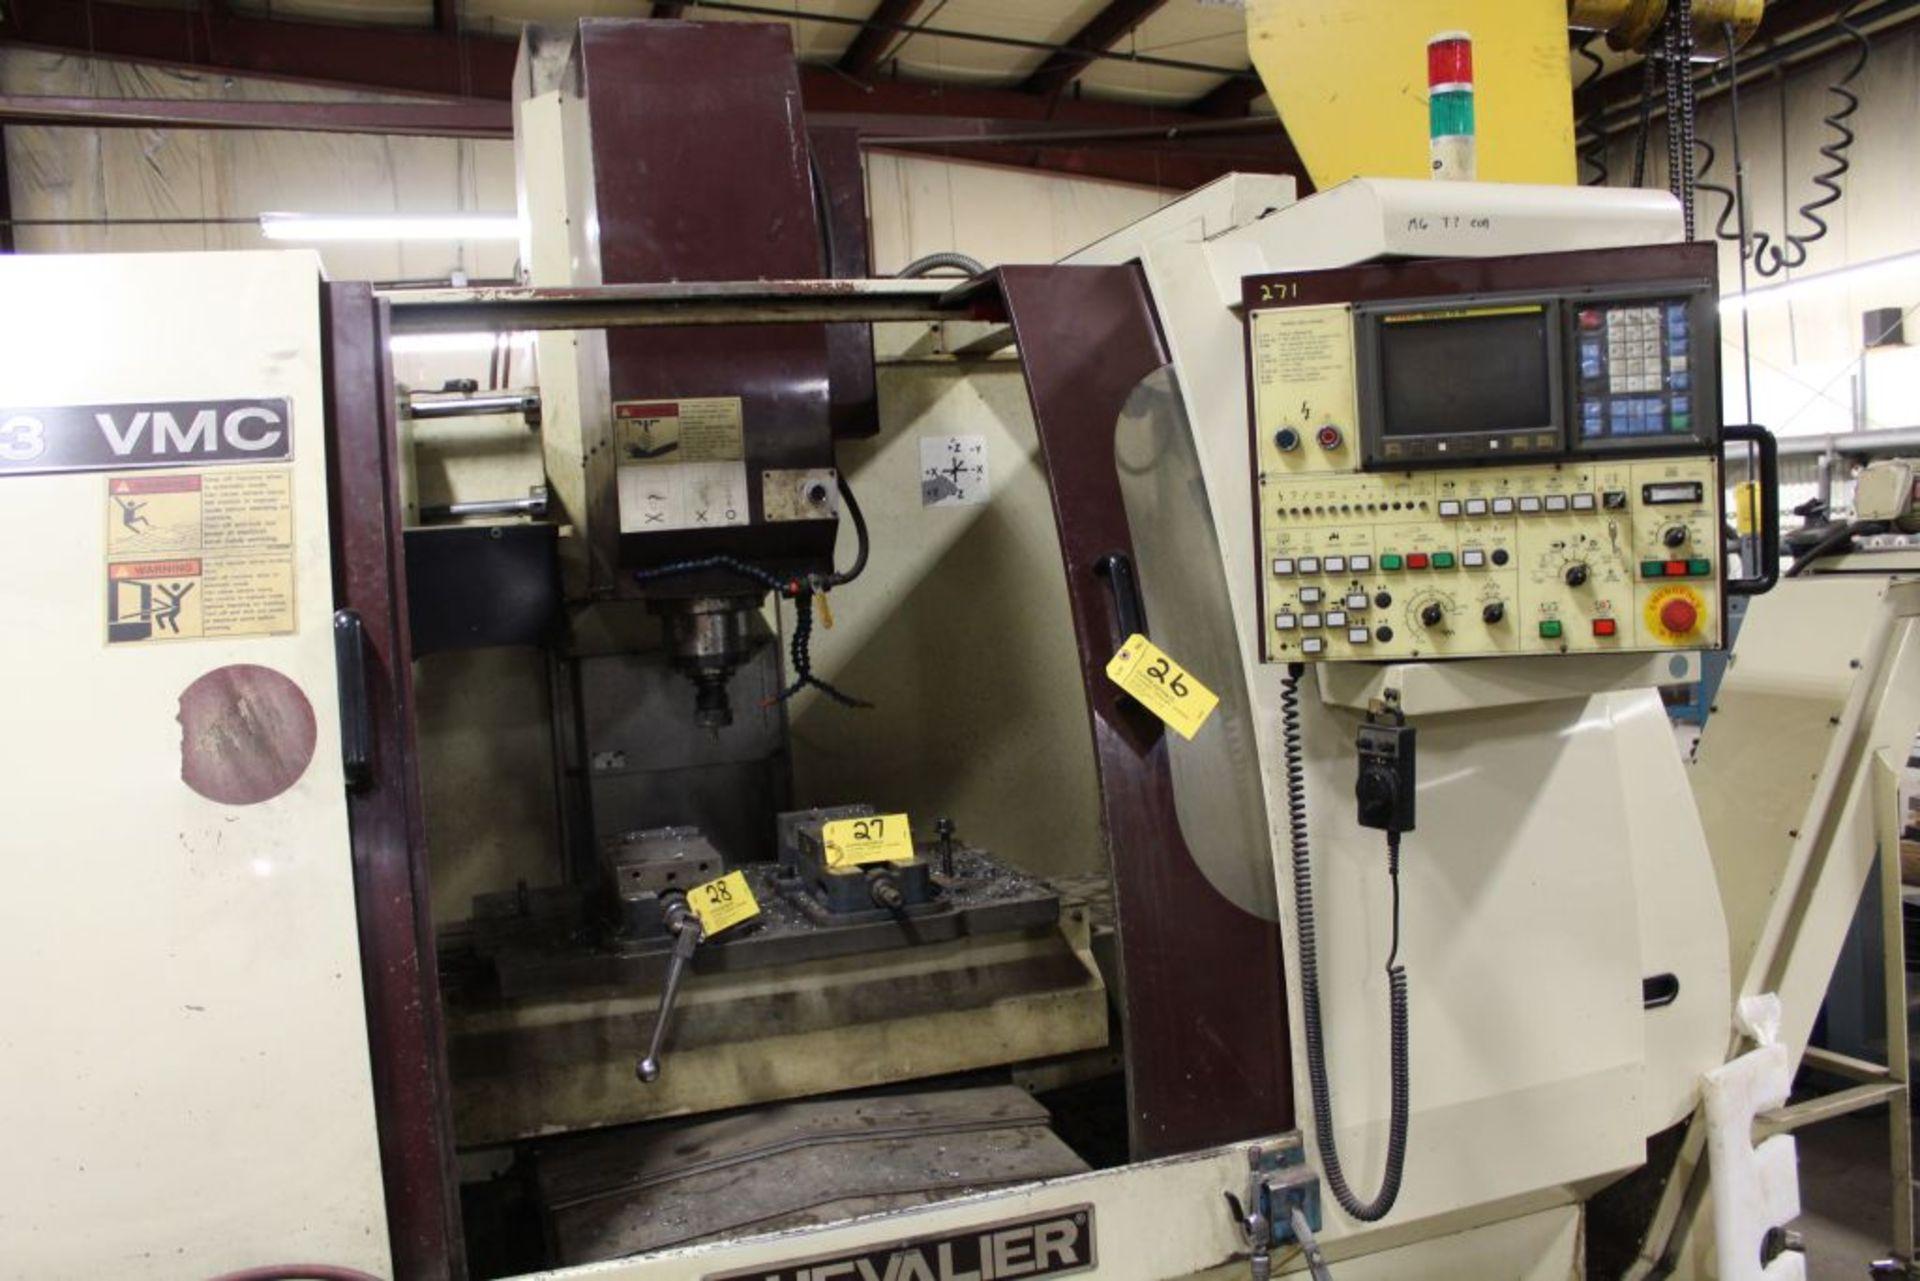 Lot 26 - Chevalier model 2033 Vertical Machining Center, sn MC875A09, 6 axis, 20 tool changer.